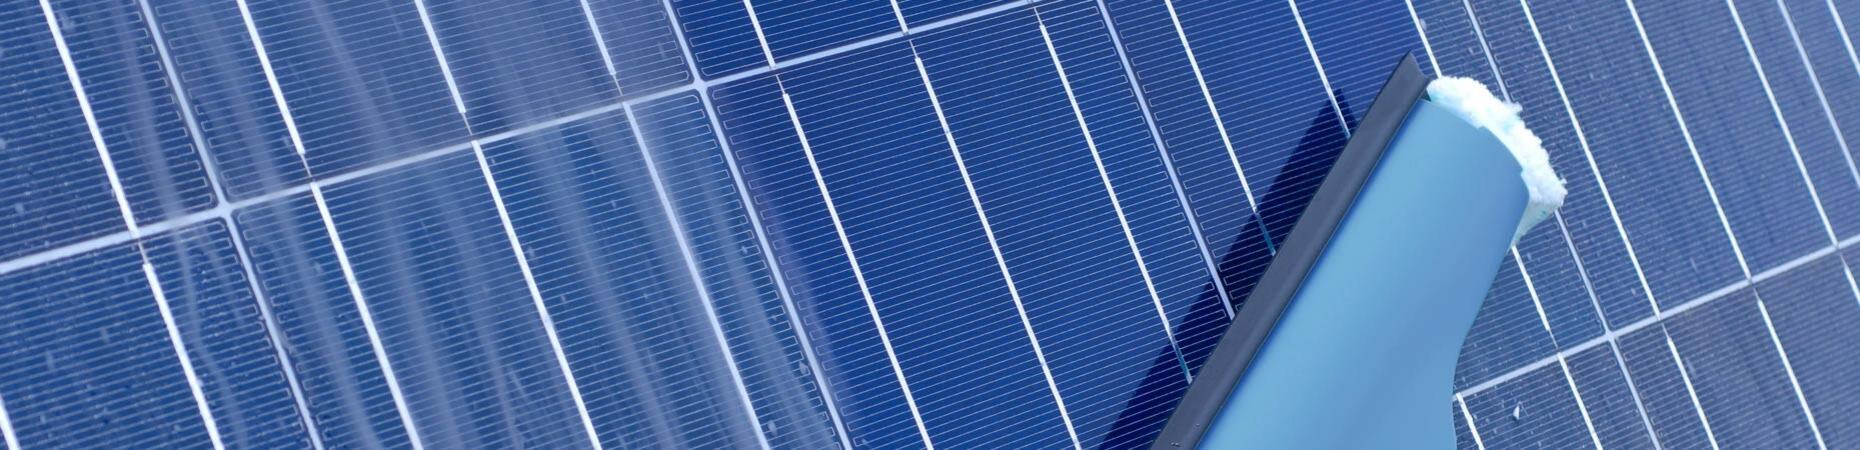 ecoservice-ferrara it pulizie-pannelli-solari-ferrara 005